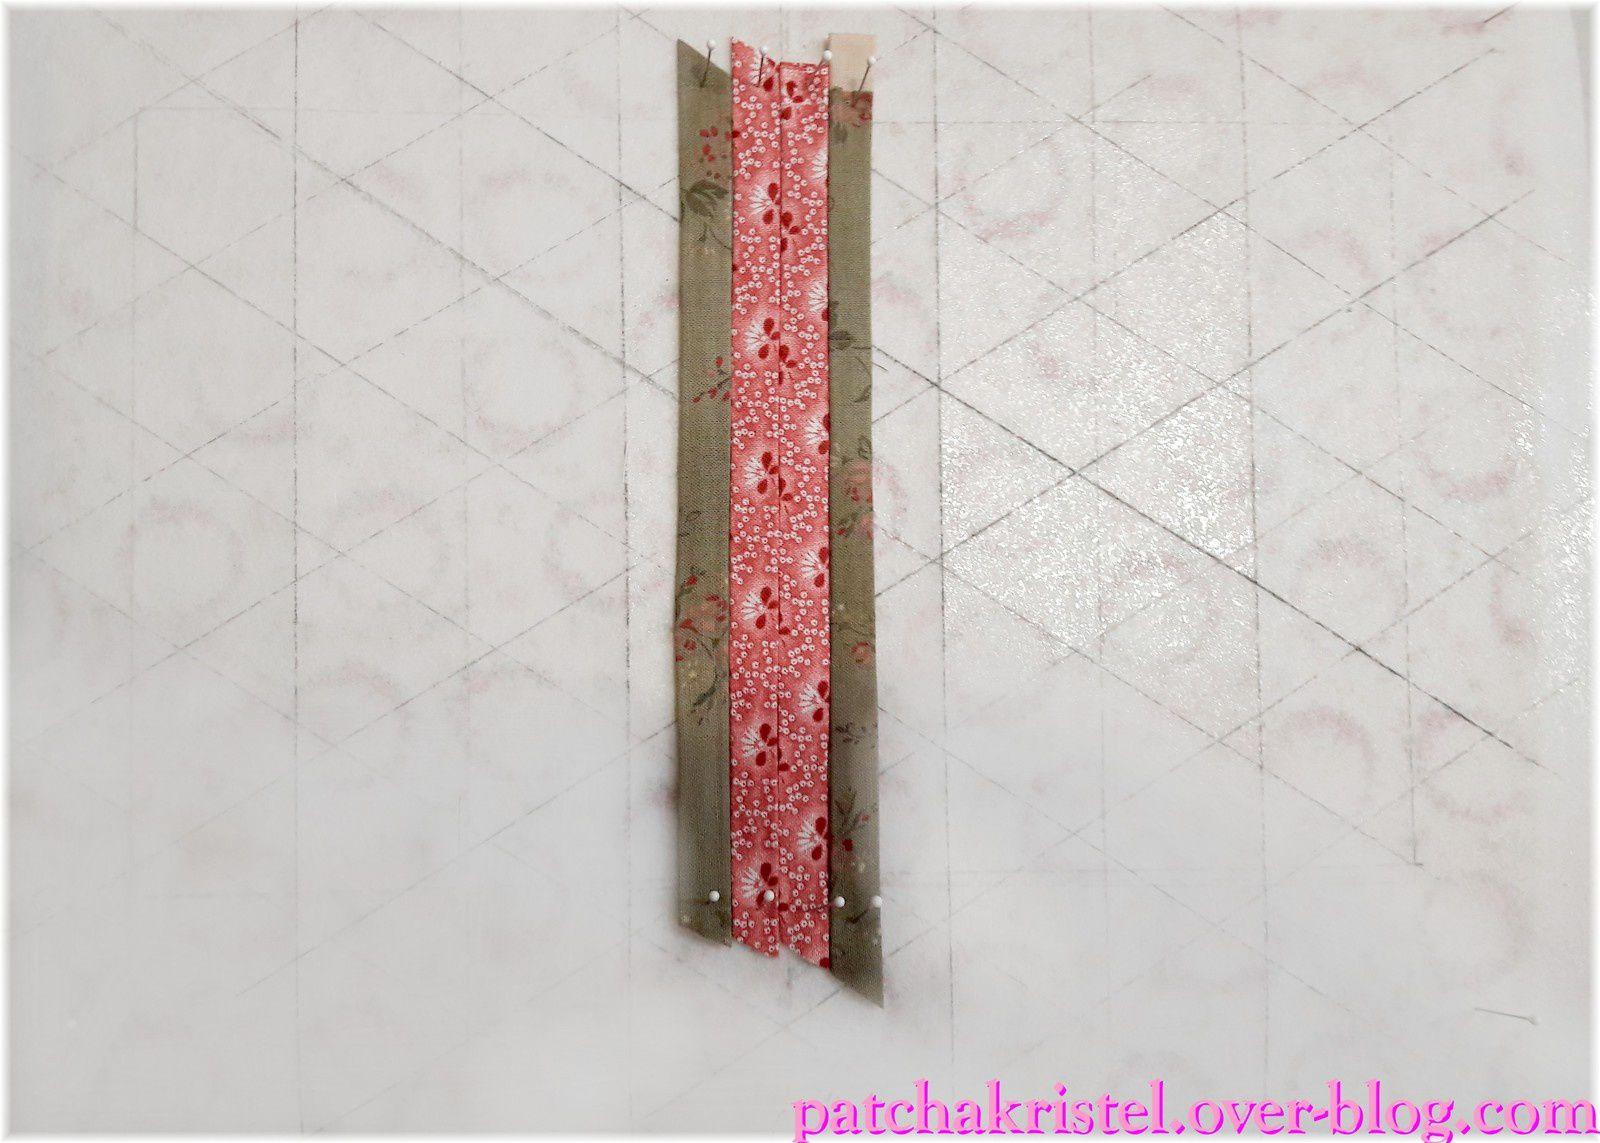 Meshwork - biais en vertical